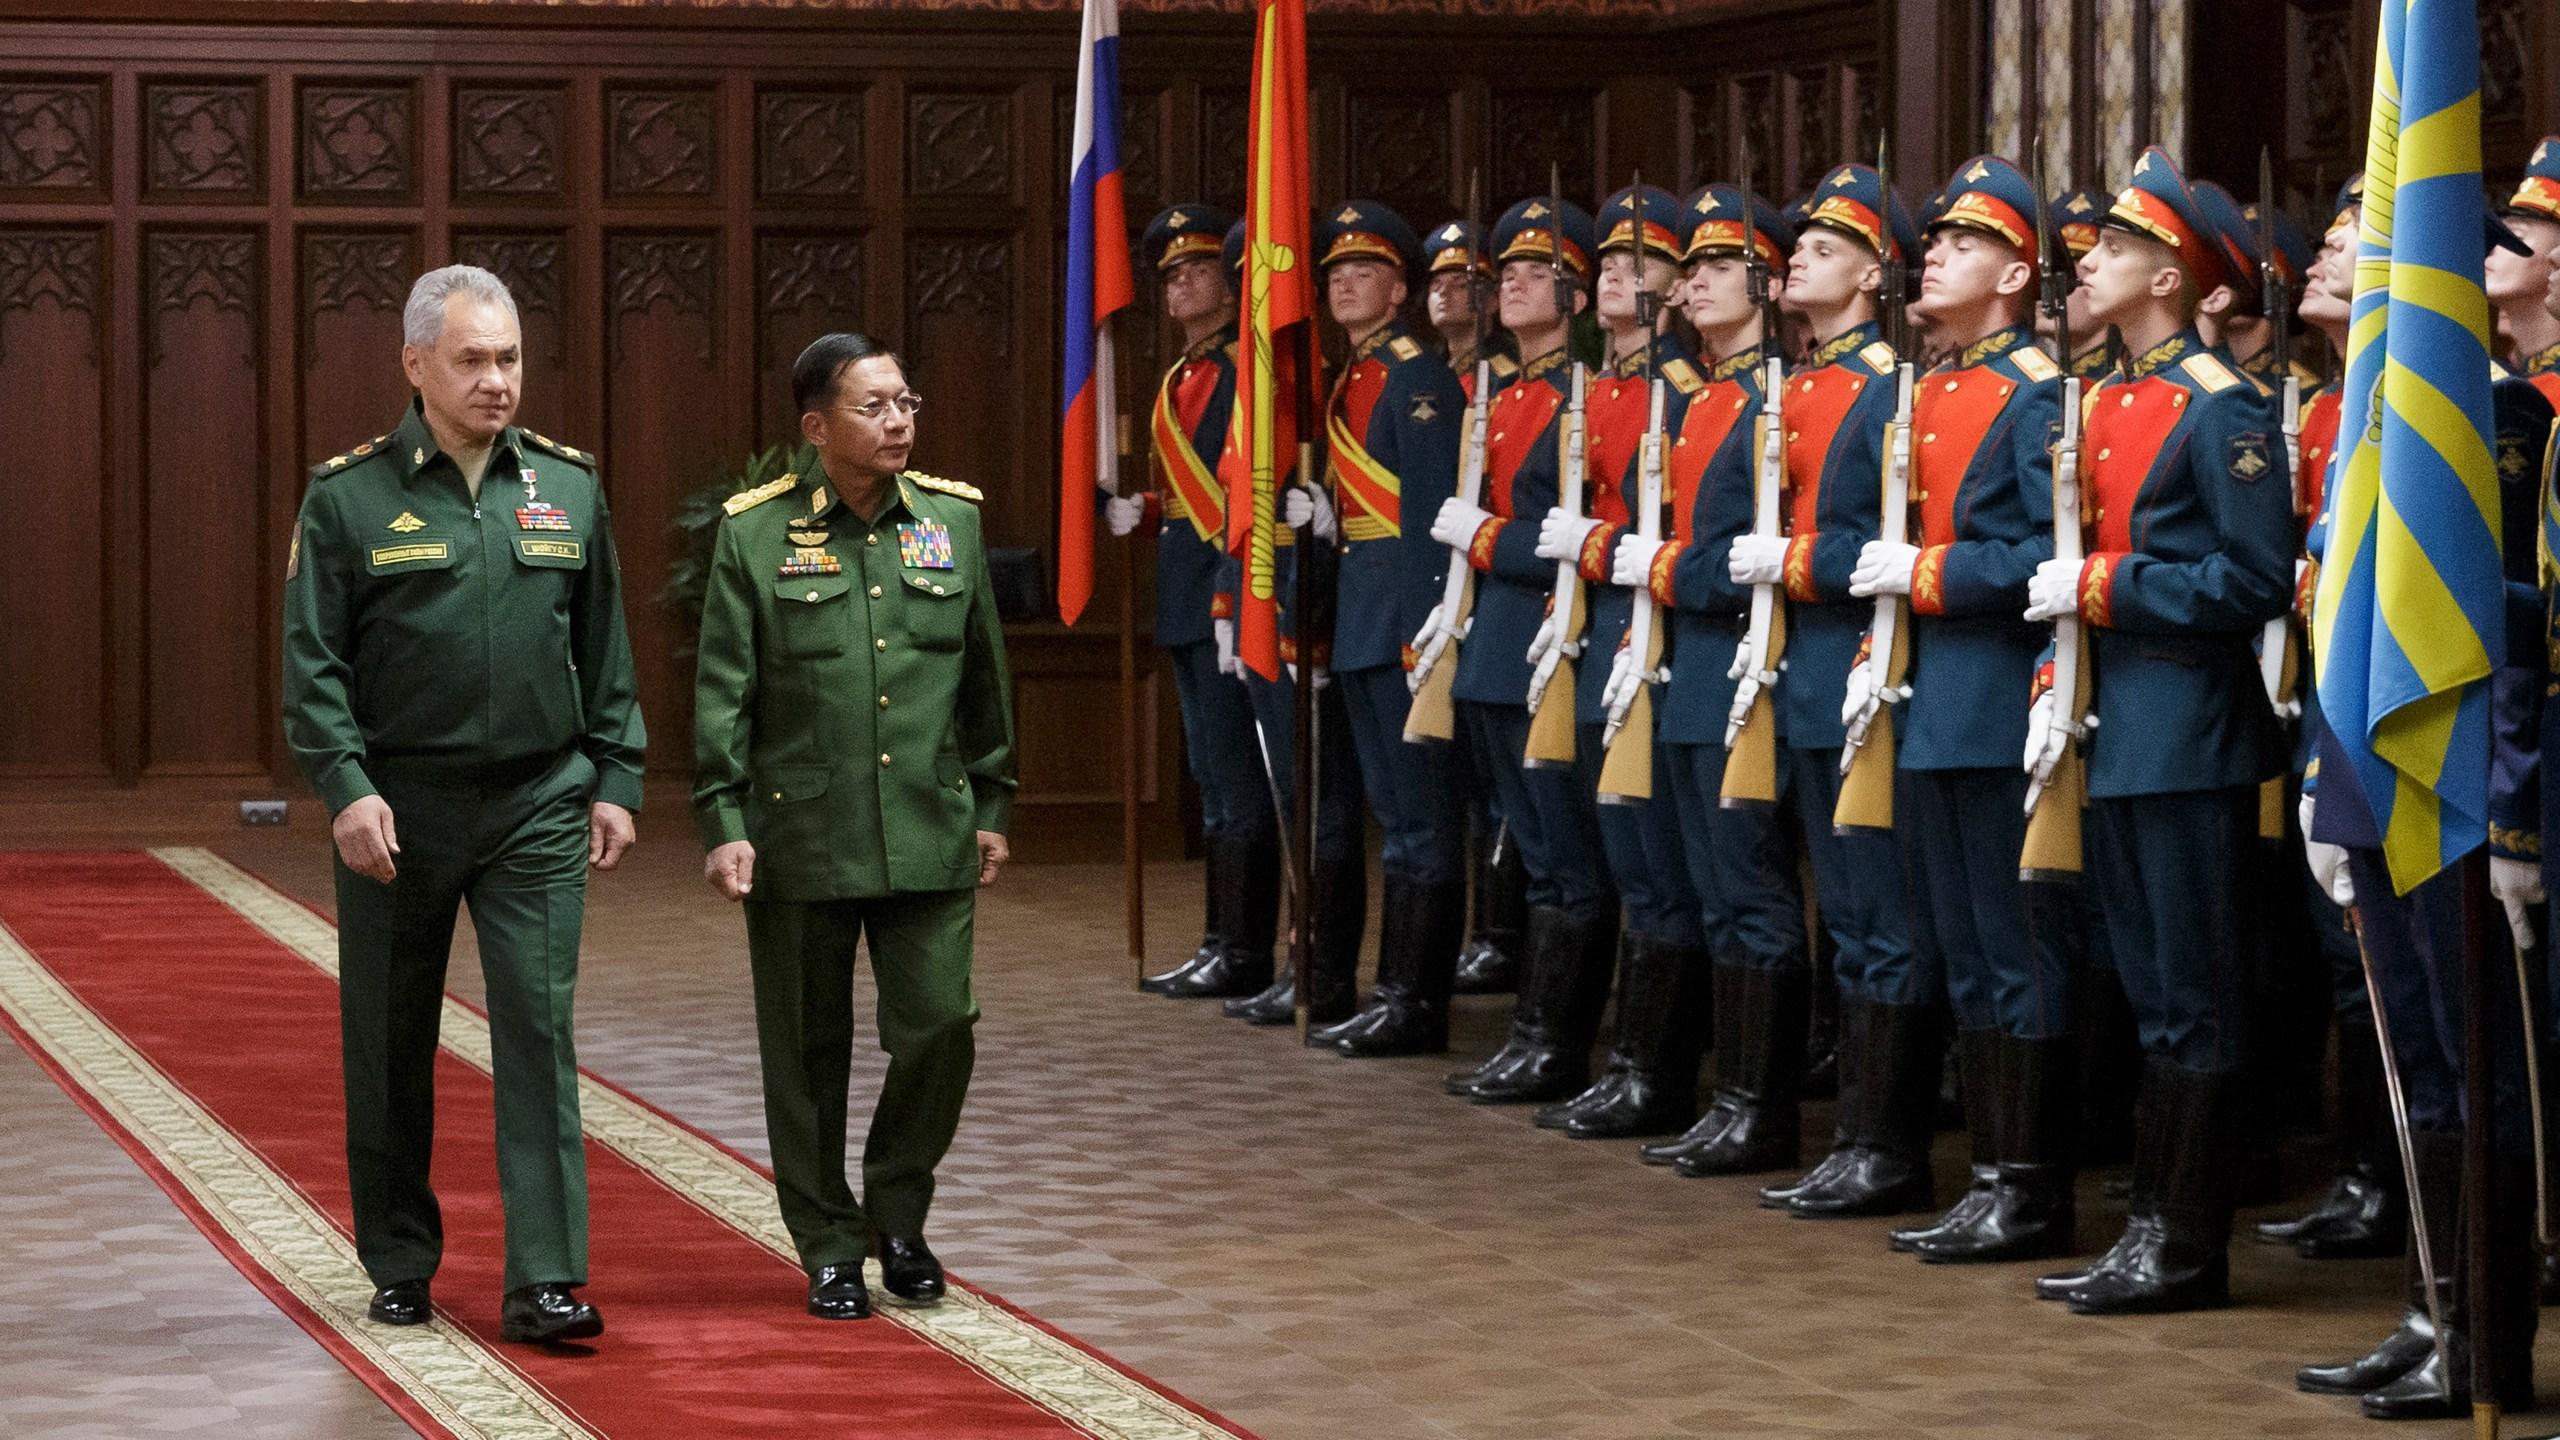 Sergei Shoigu, Min Aung Hlaing